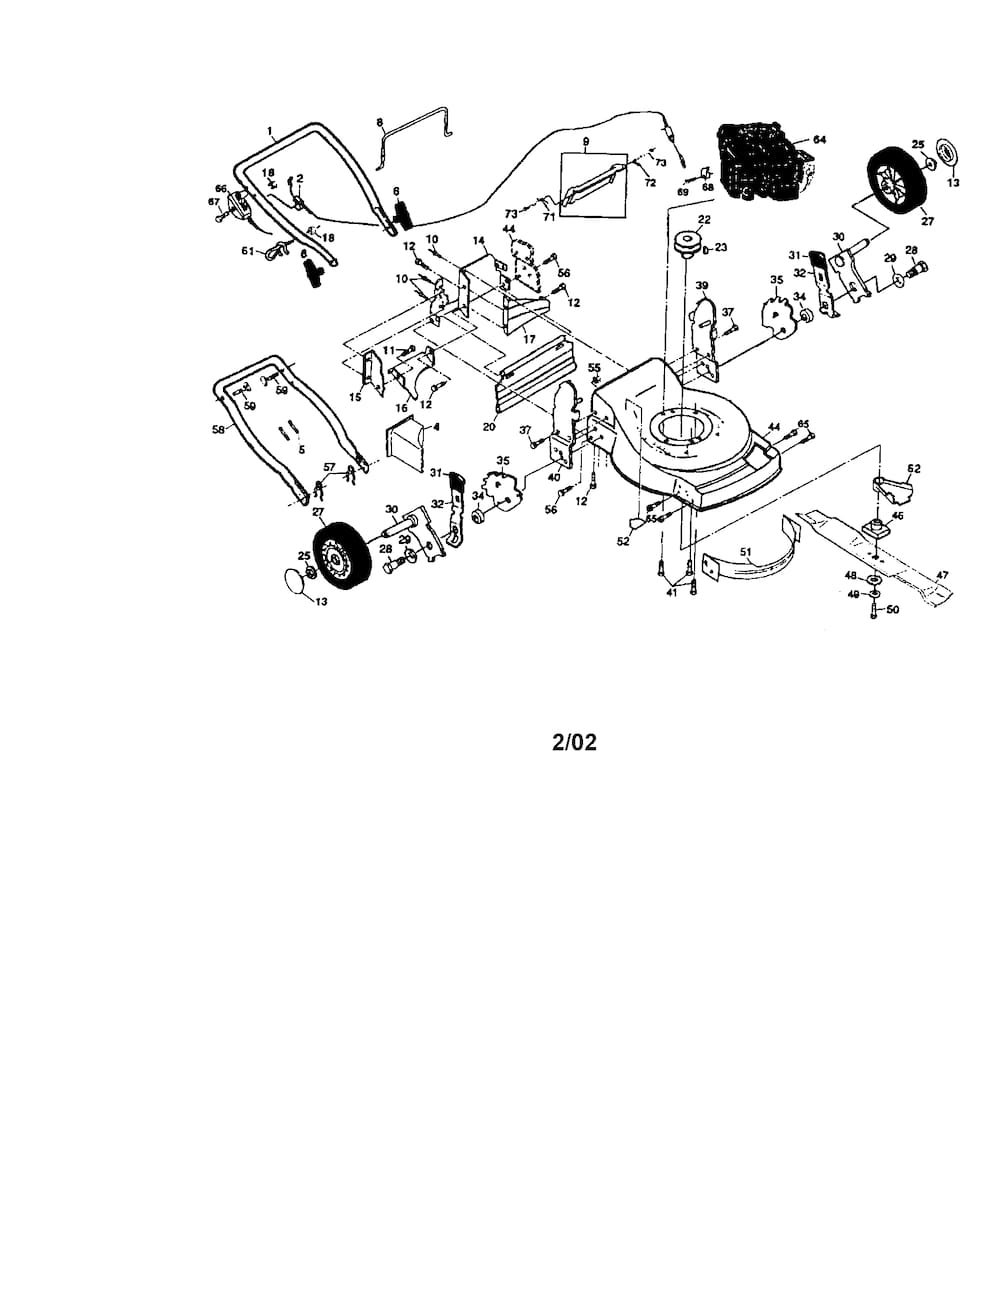 medium resolution of john deere js20 lawn mower diagram john free engine